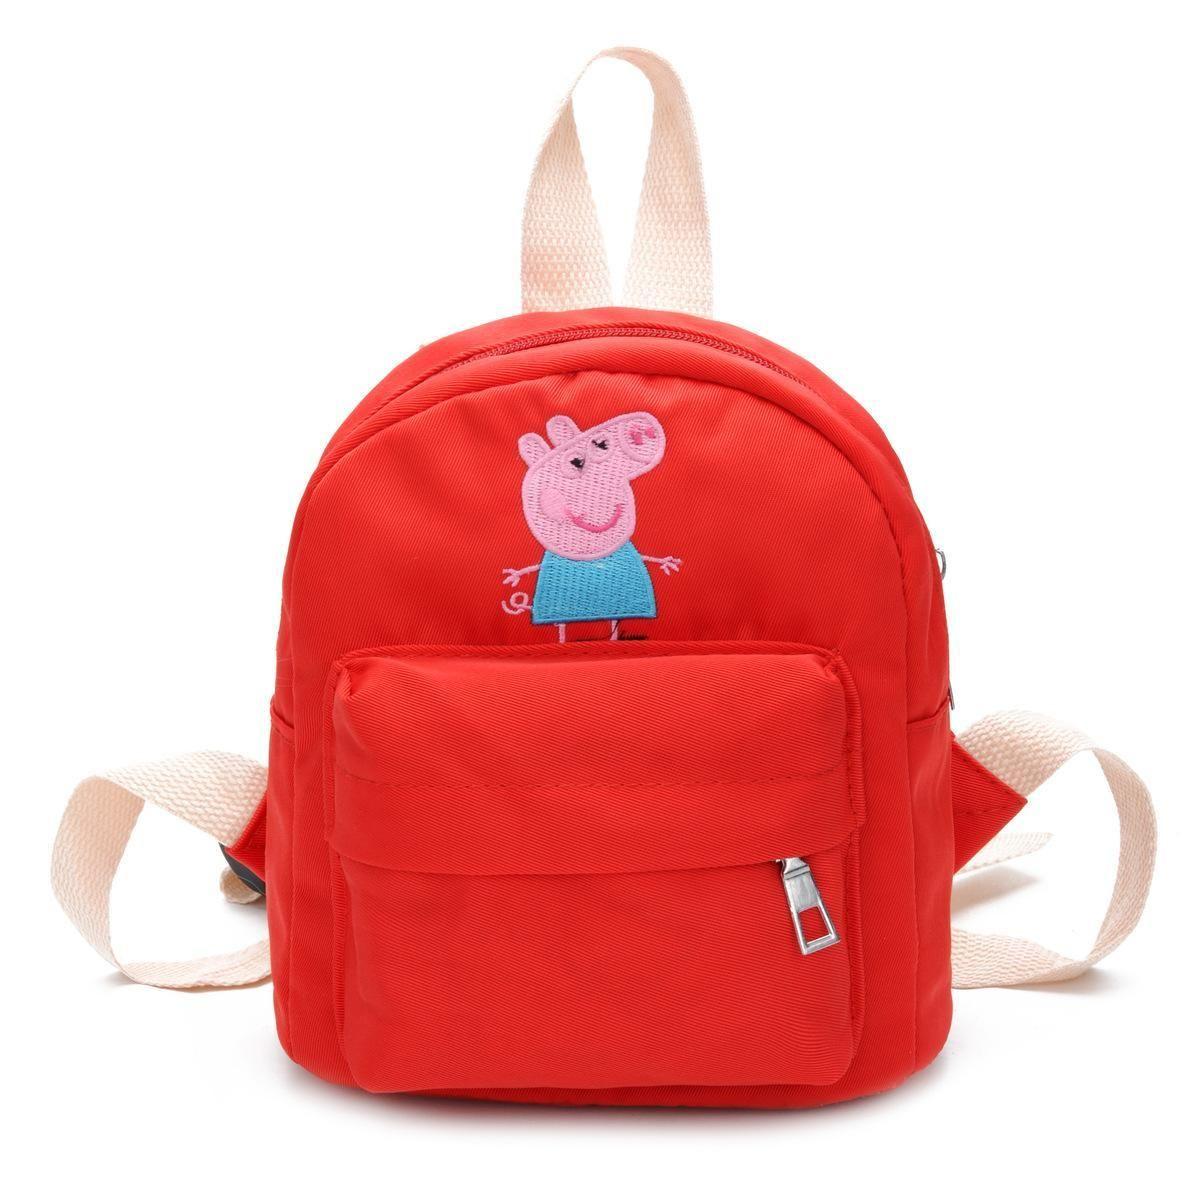 ffbf481fe9 2018 Summer New Pattern Hot Sale Children Bag Lovely Animal Cartoon ...